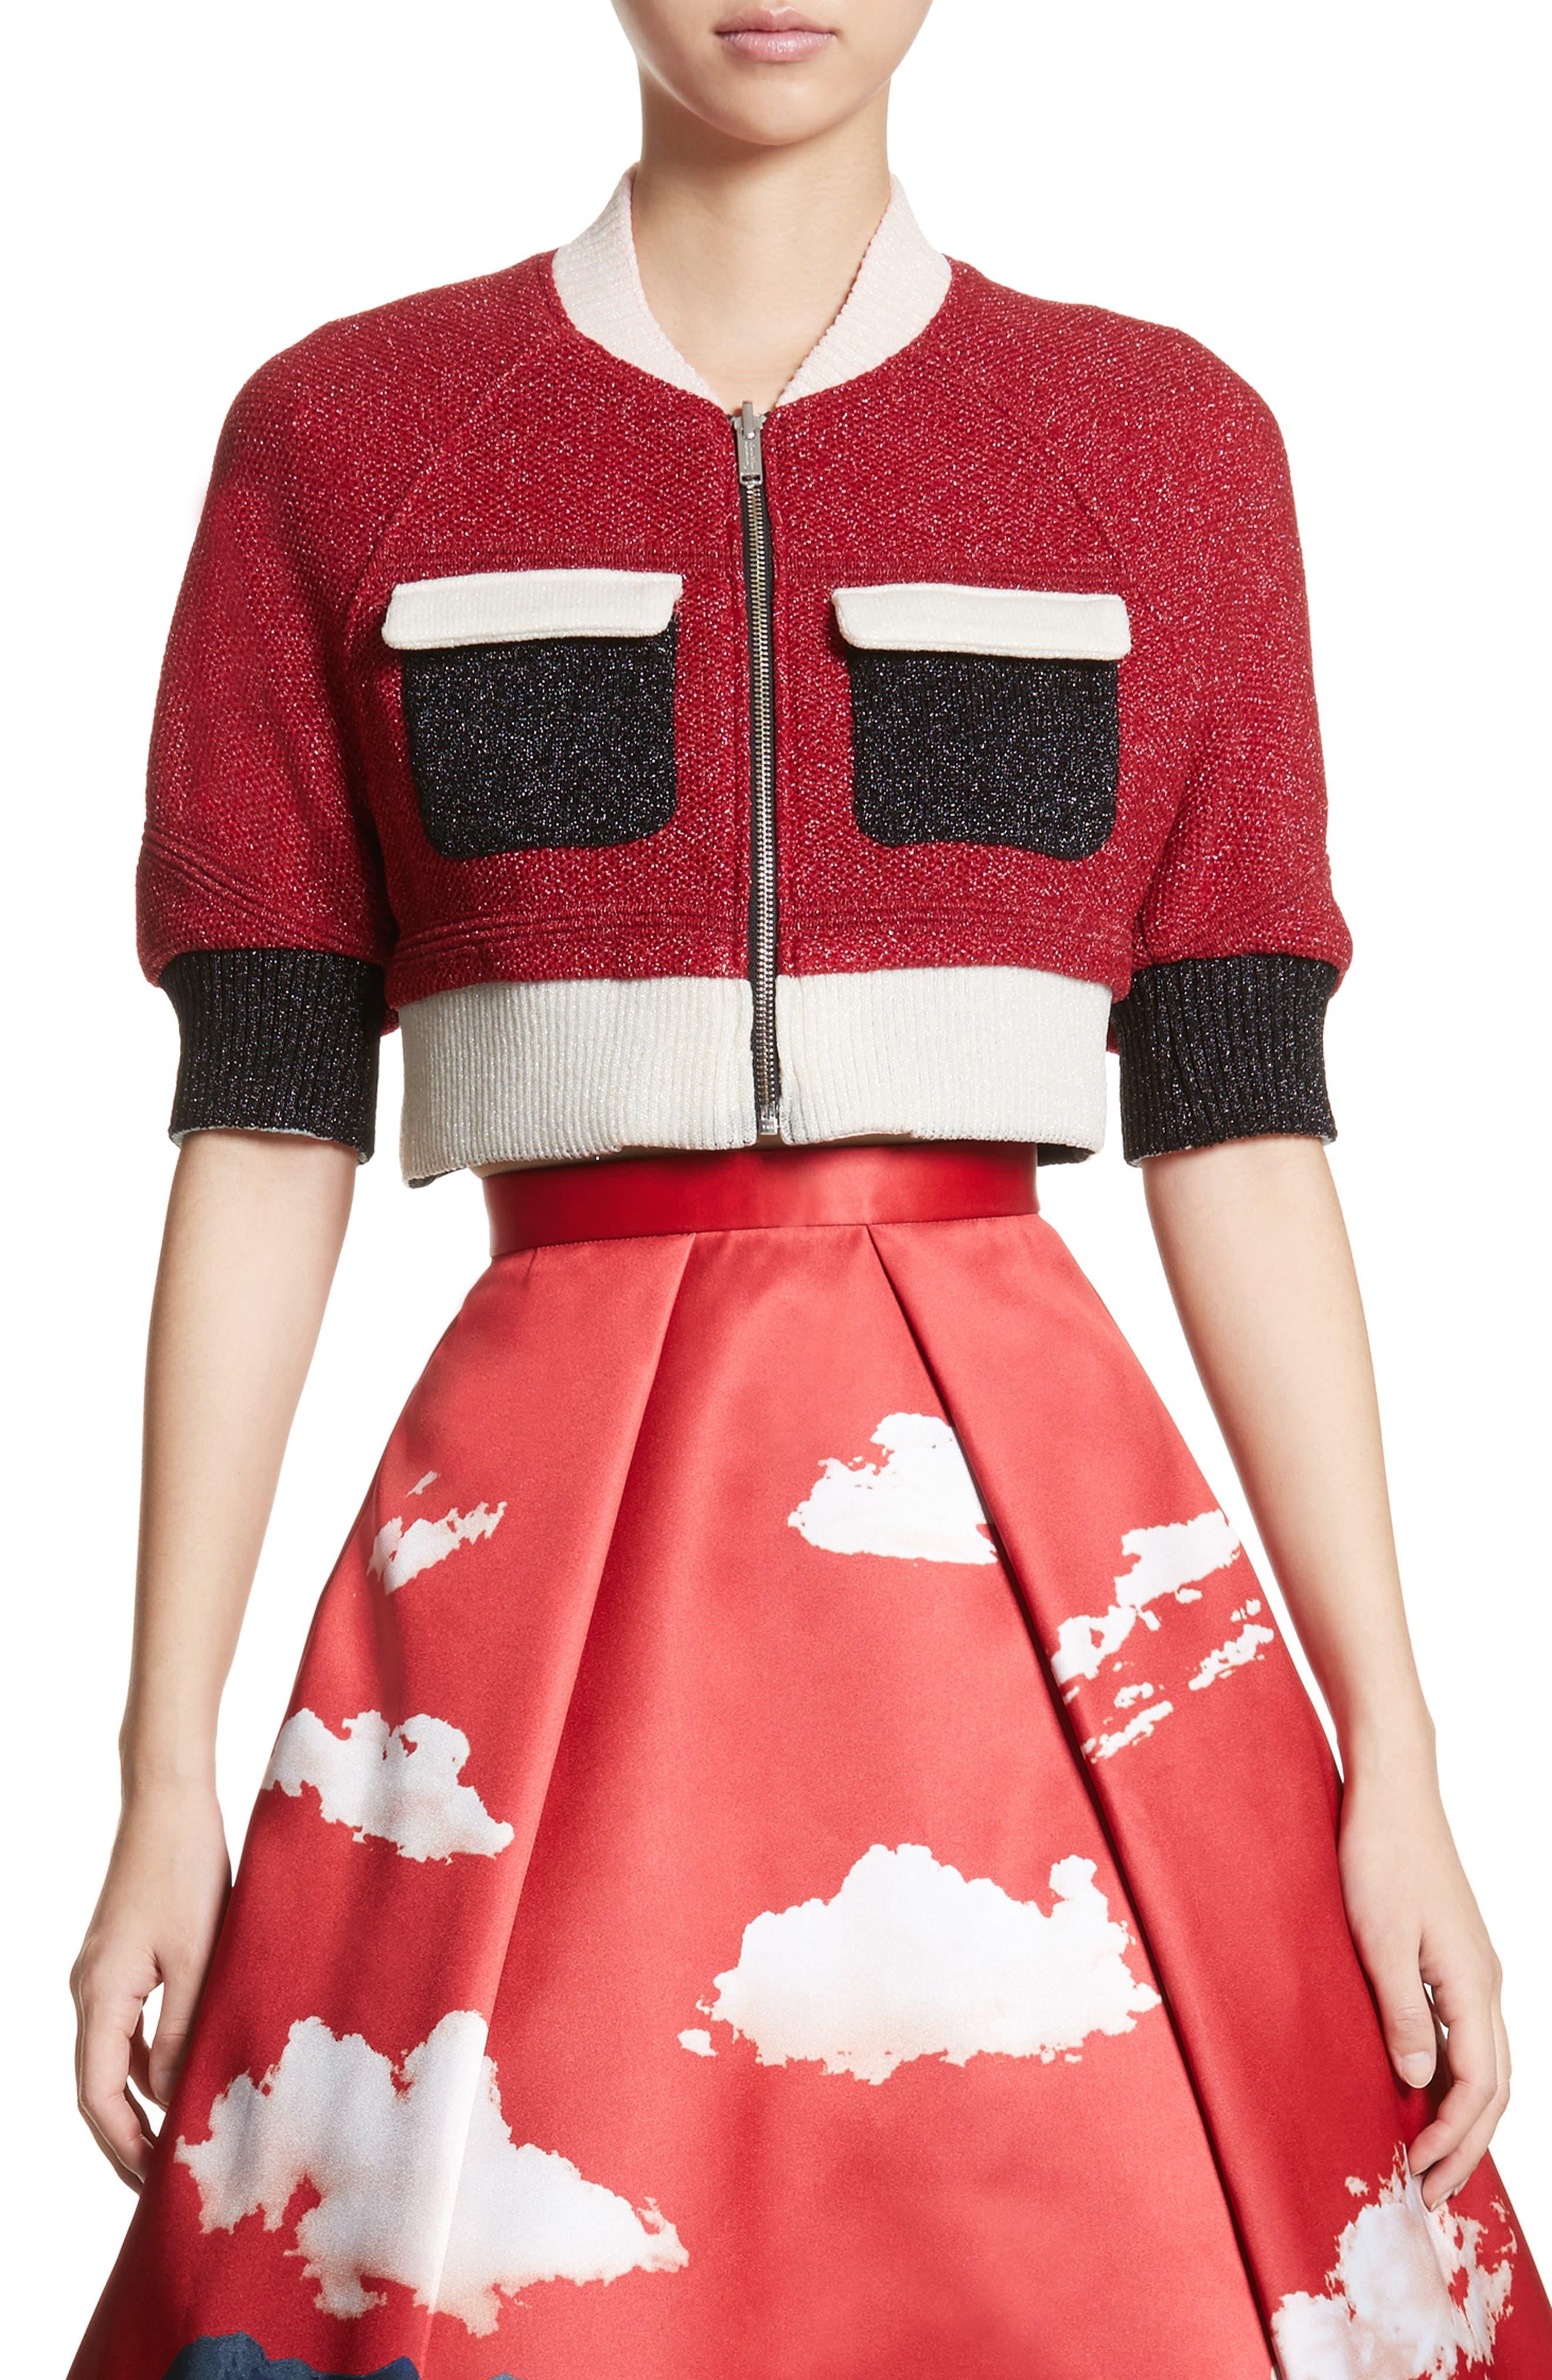 Reversible Crop Jacket,                         Main,                         color, Brown/ Red